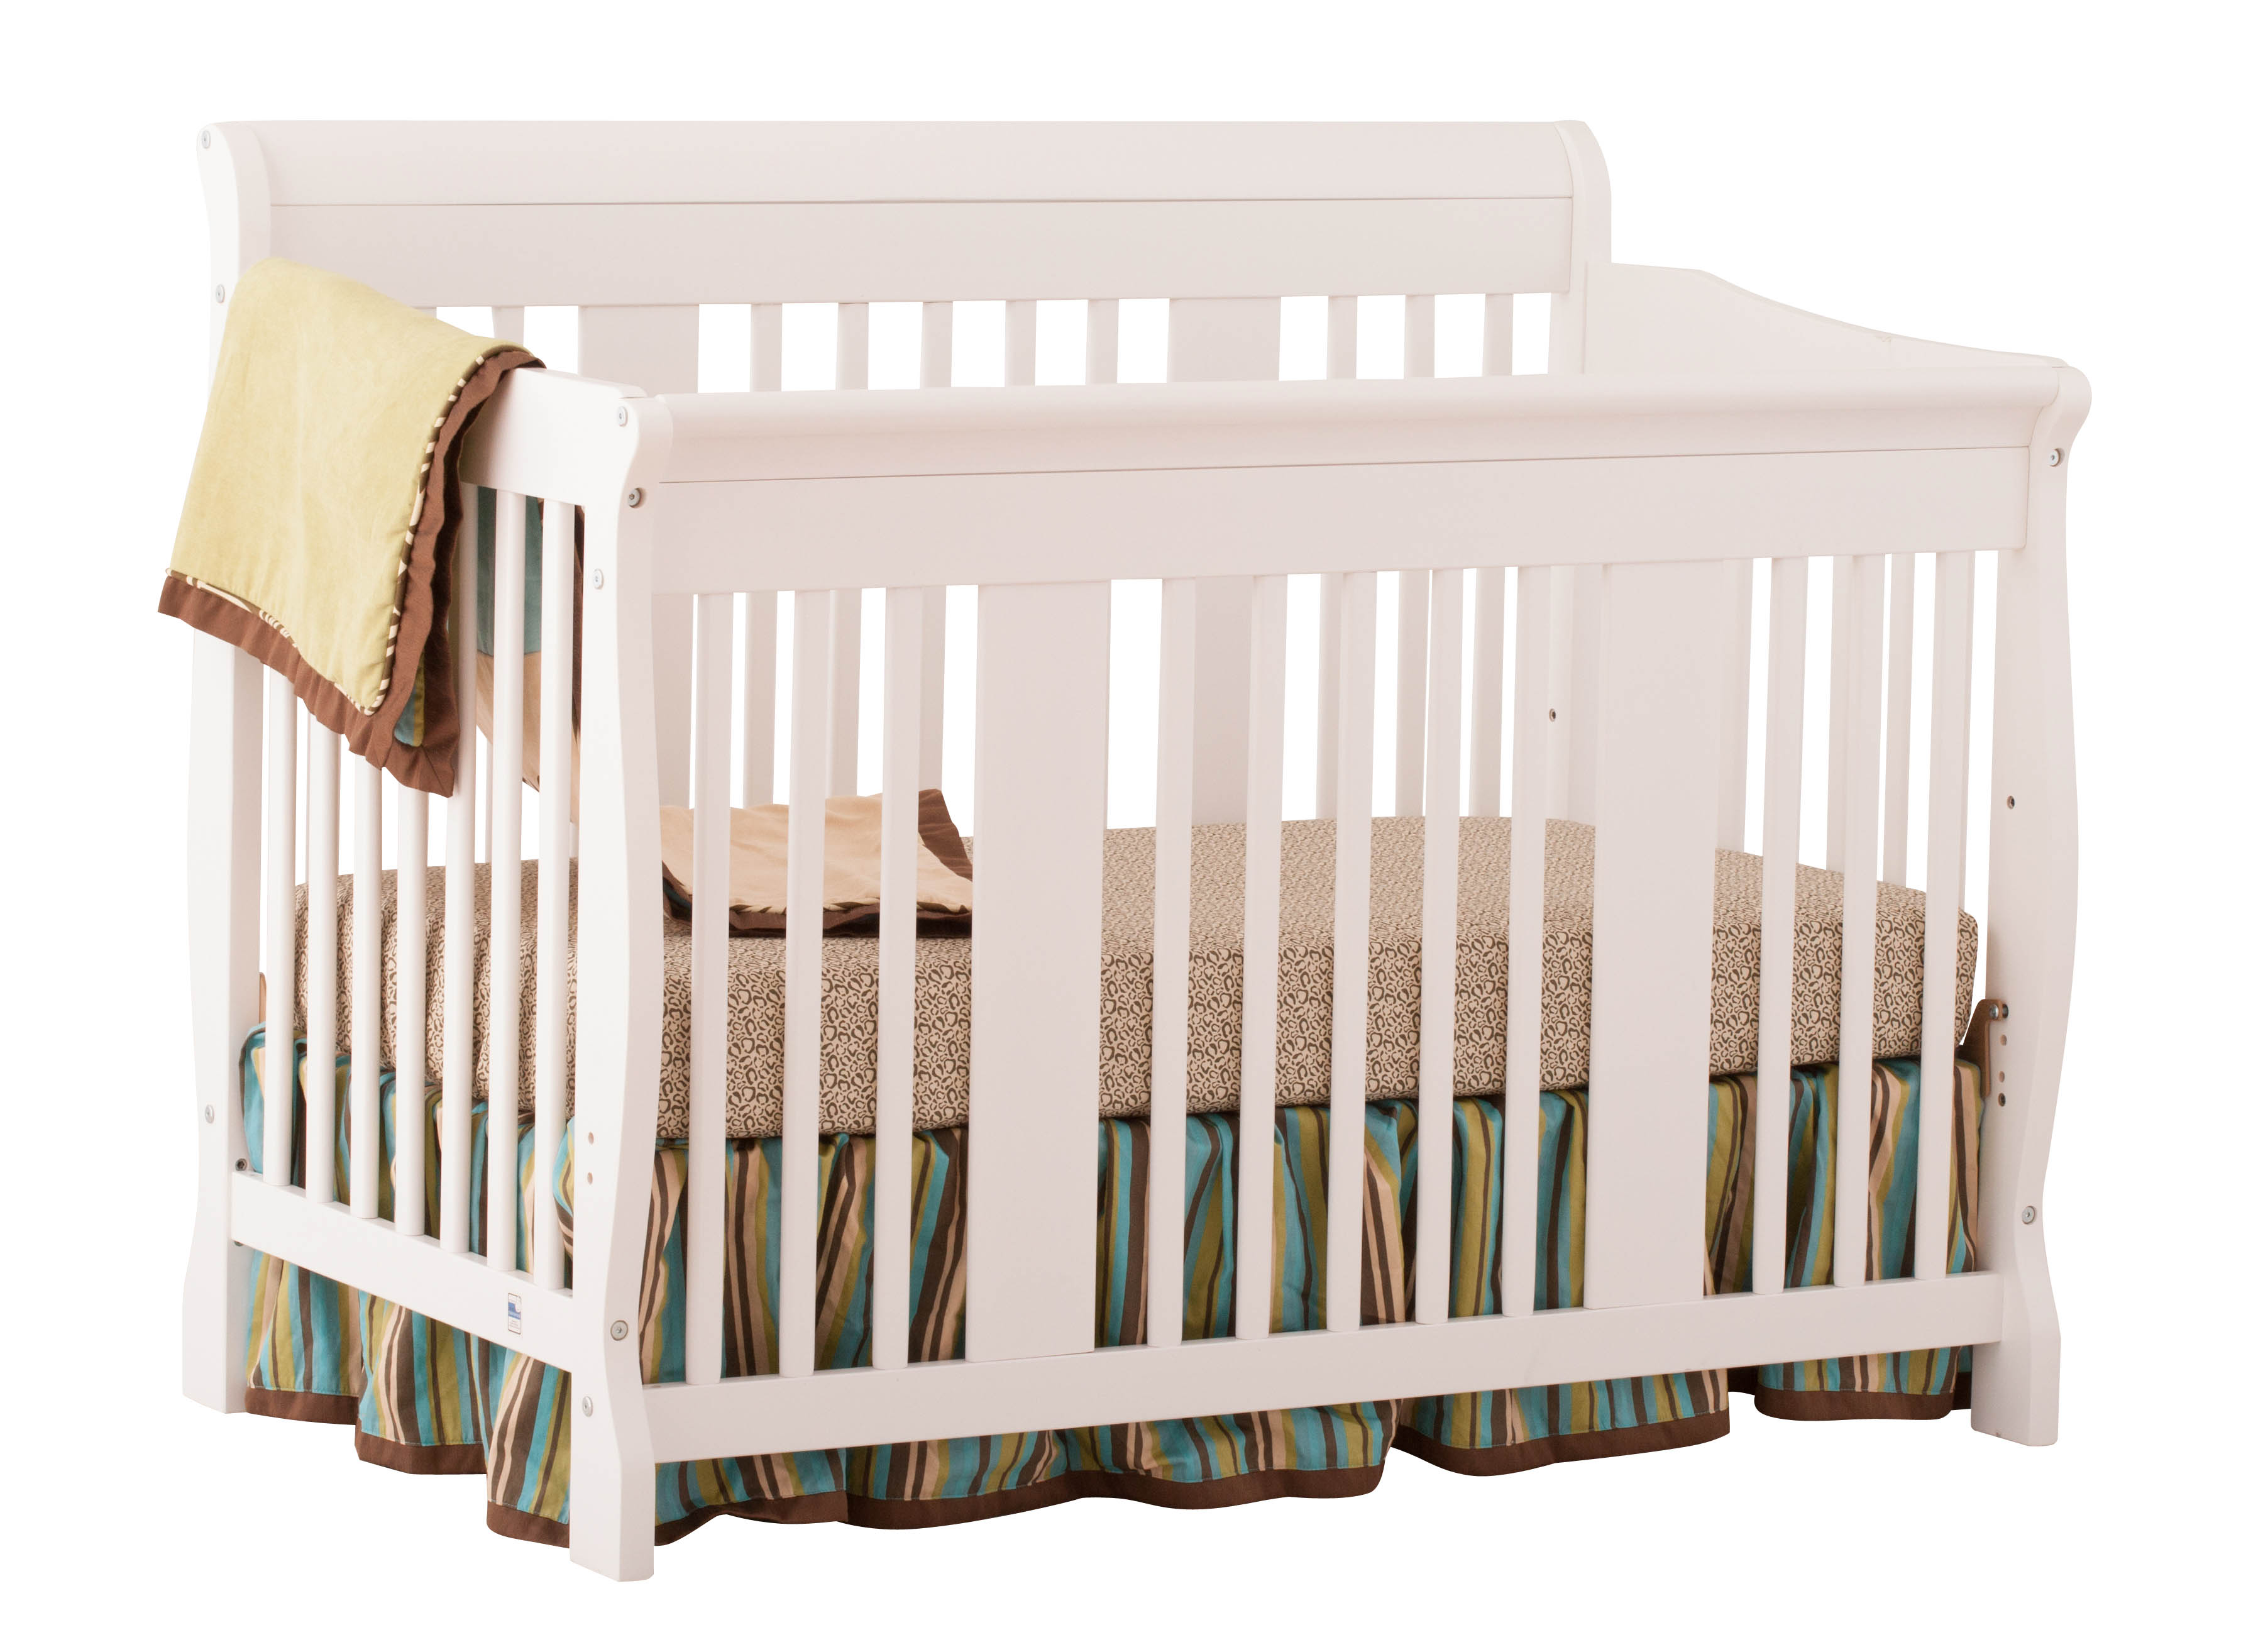 Tuscany 4 in 1 Convertible Crib - White